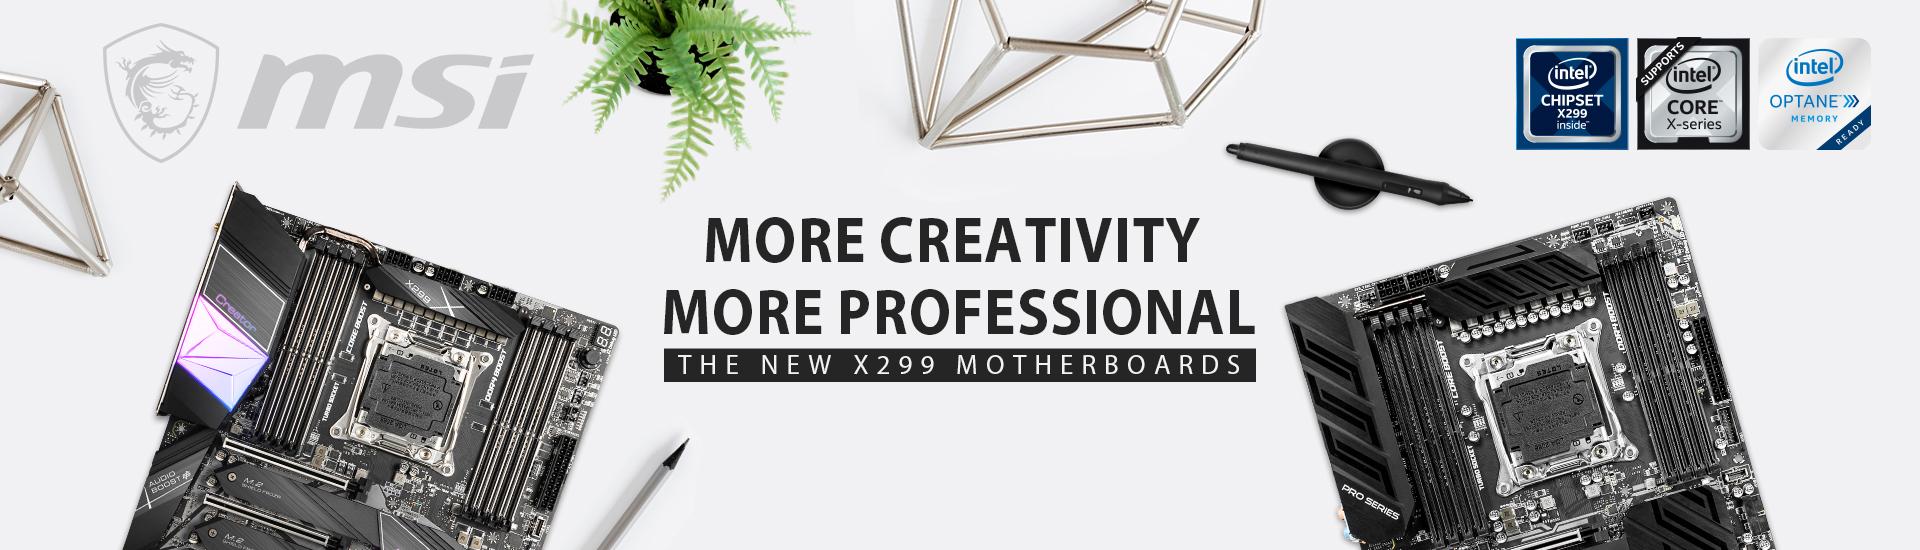 1920x550 โปรเฟรชั่นนอลกว่าด้วยเมนบอร์ดสายครีเอเตอร์ MSI CREATOR X299 คู่กับ CPU INTEL CORE X SERIES รุ่นใหม่ แรงสุด!!